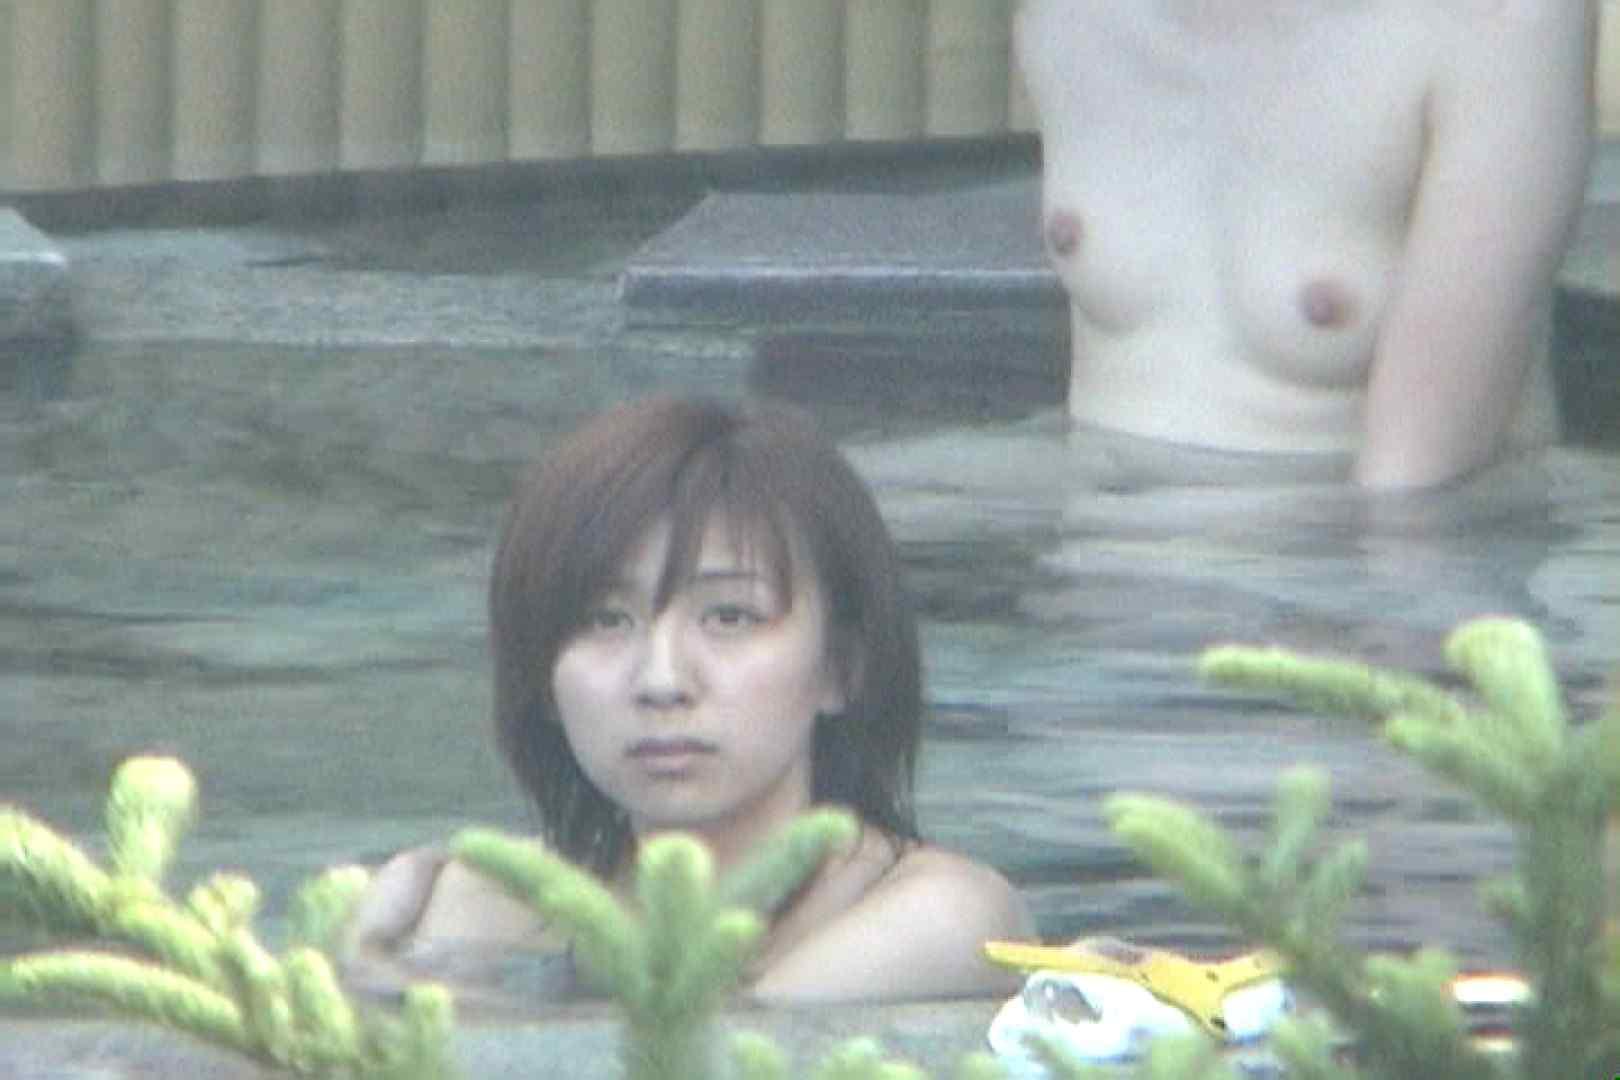 Aquaな露天風呂Vol.77【VIP限定】 盗撮   OLセックス  107画像 67